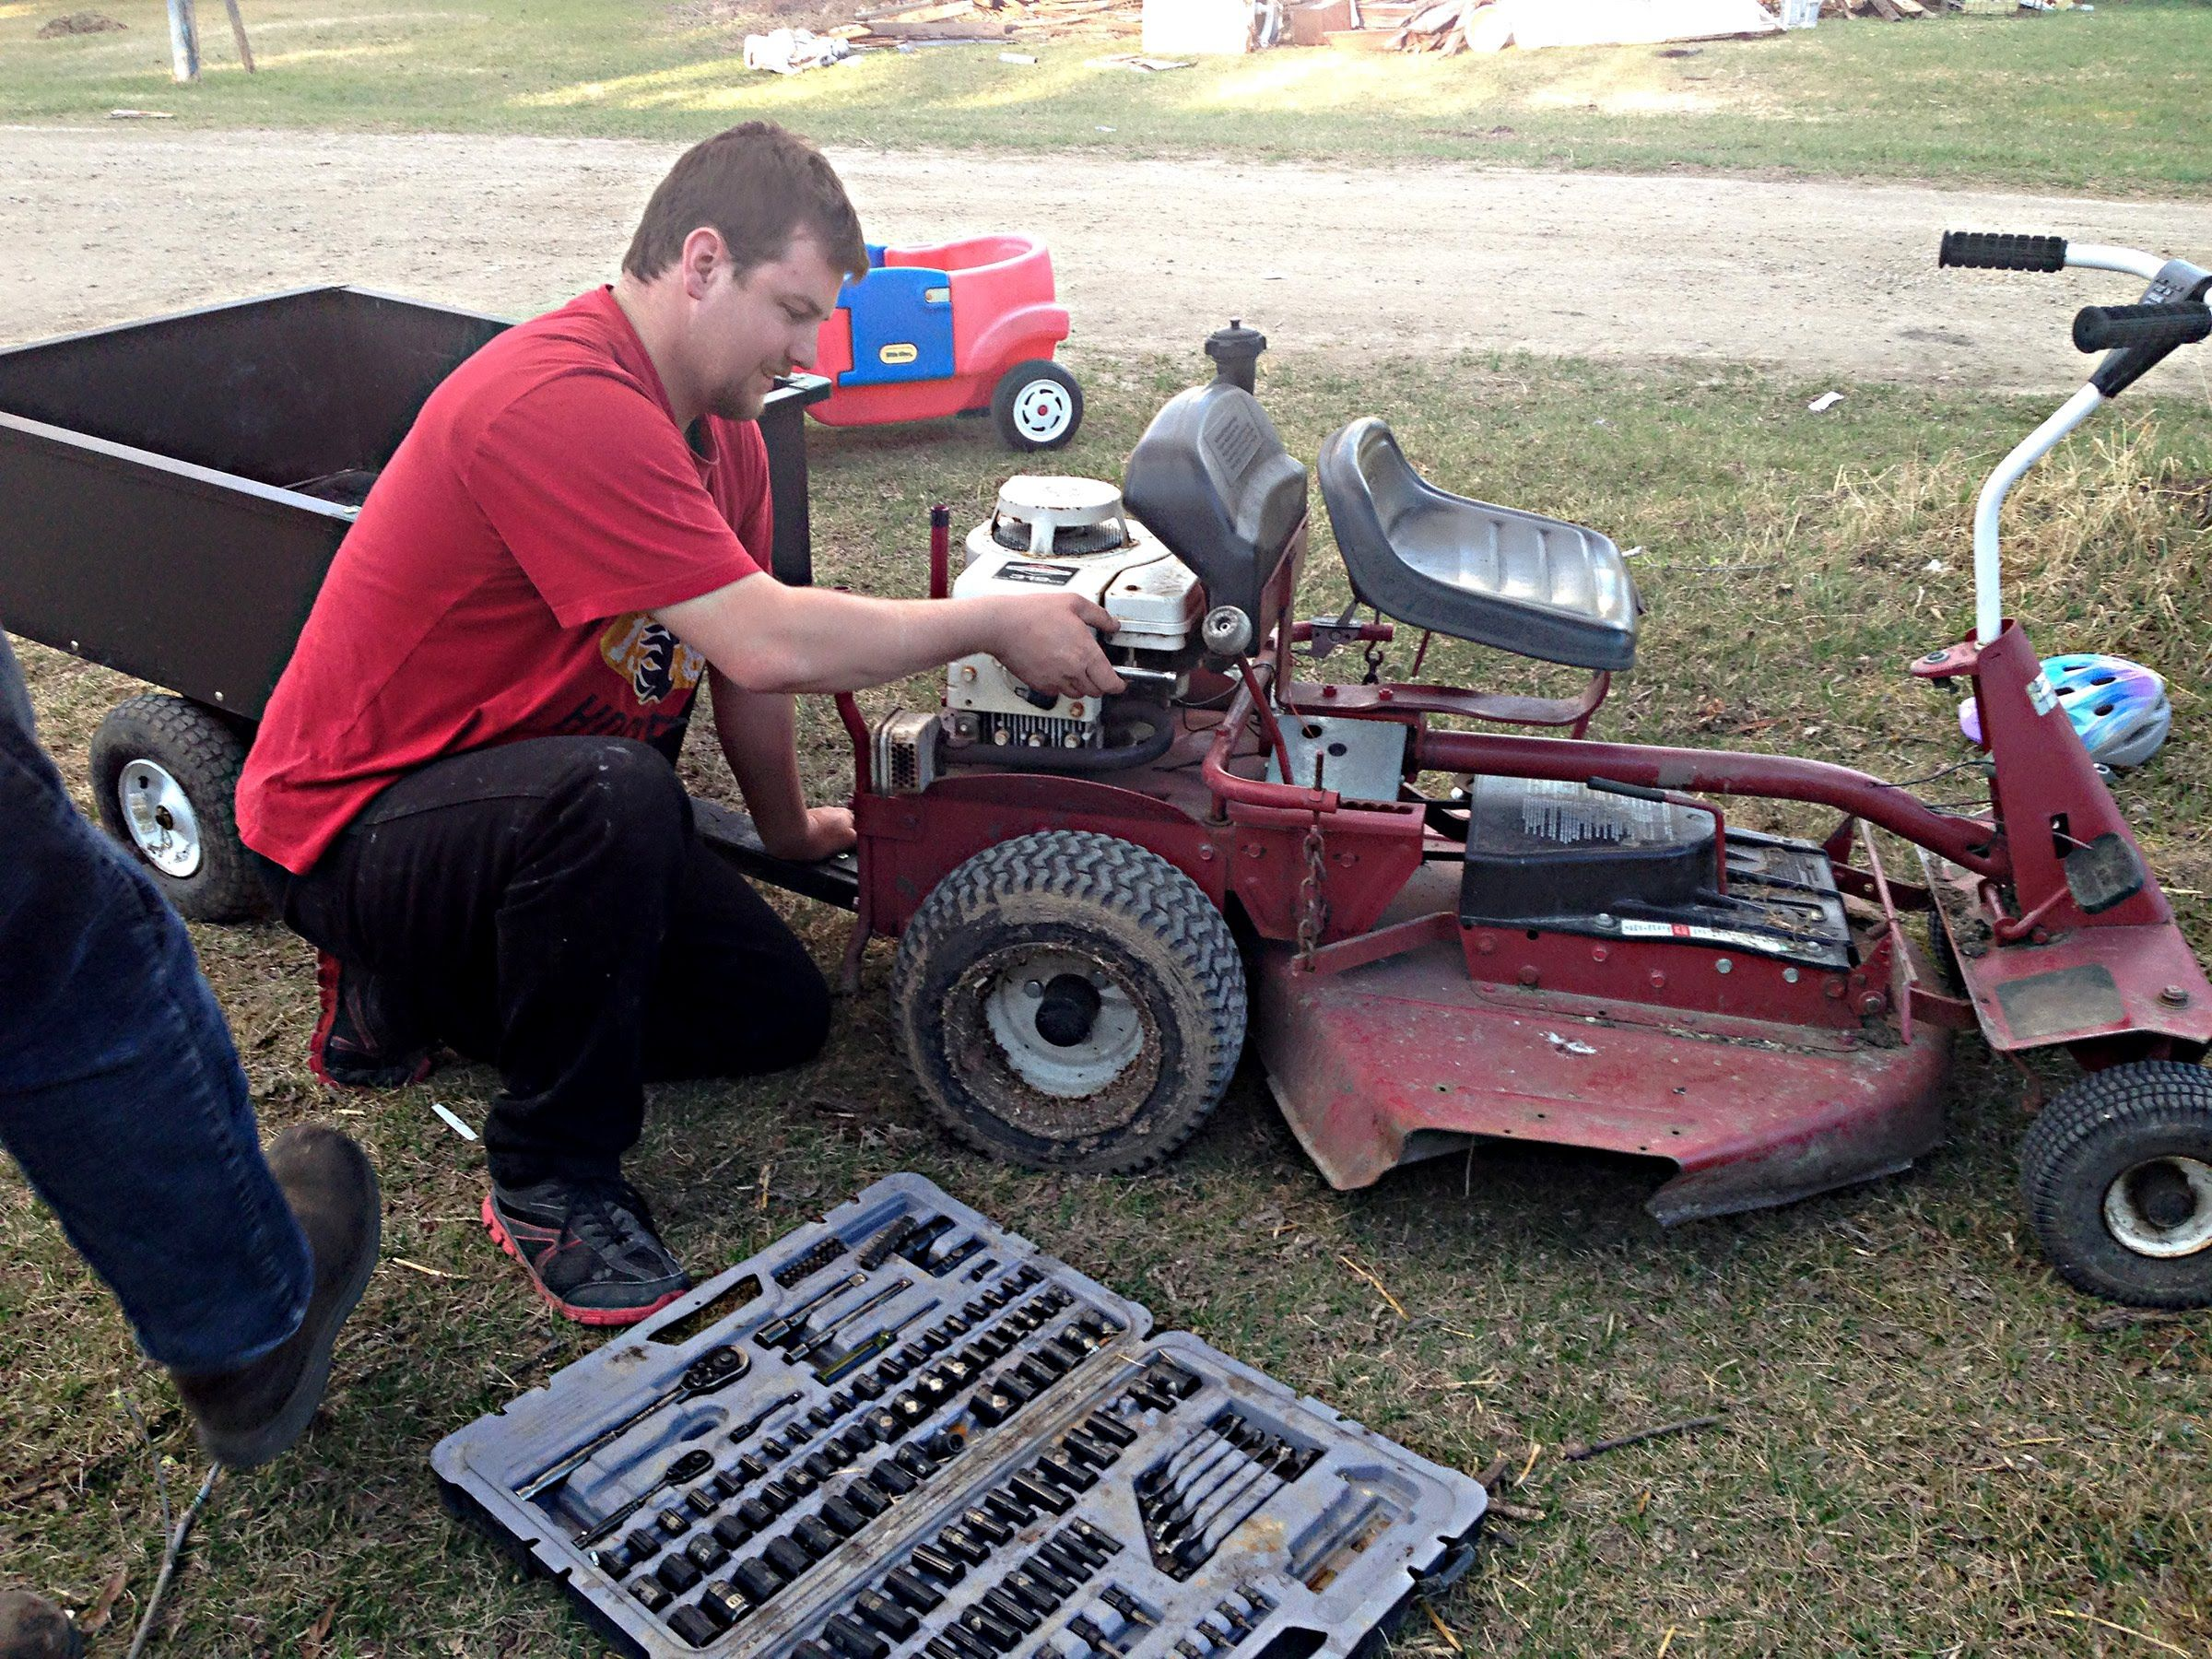 Old Snapper Tractor Wiring Harness Riding Lawn Mower Screech School Pinterest 2400x1800